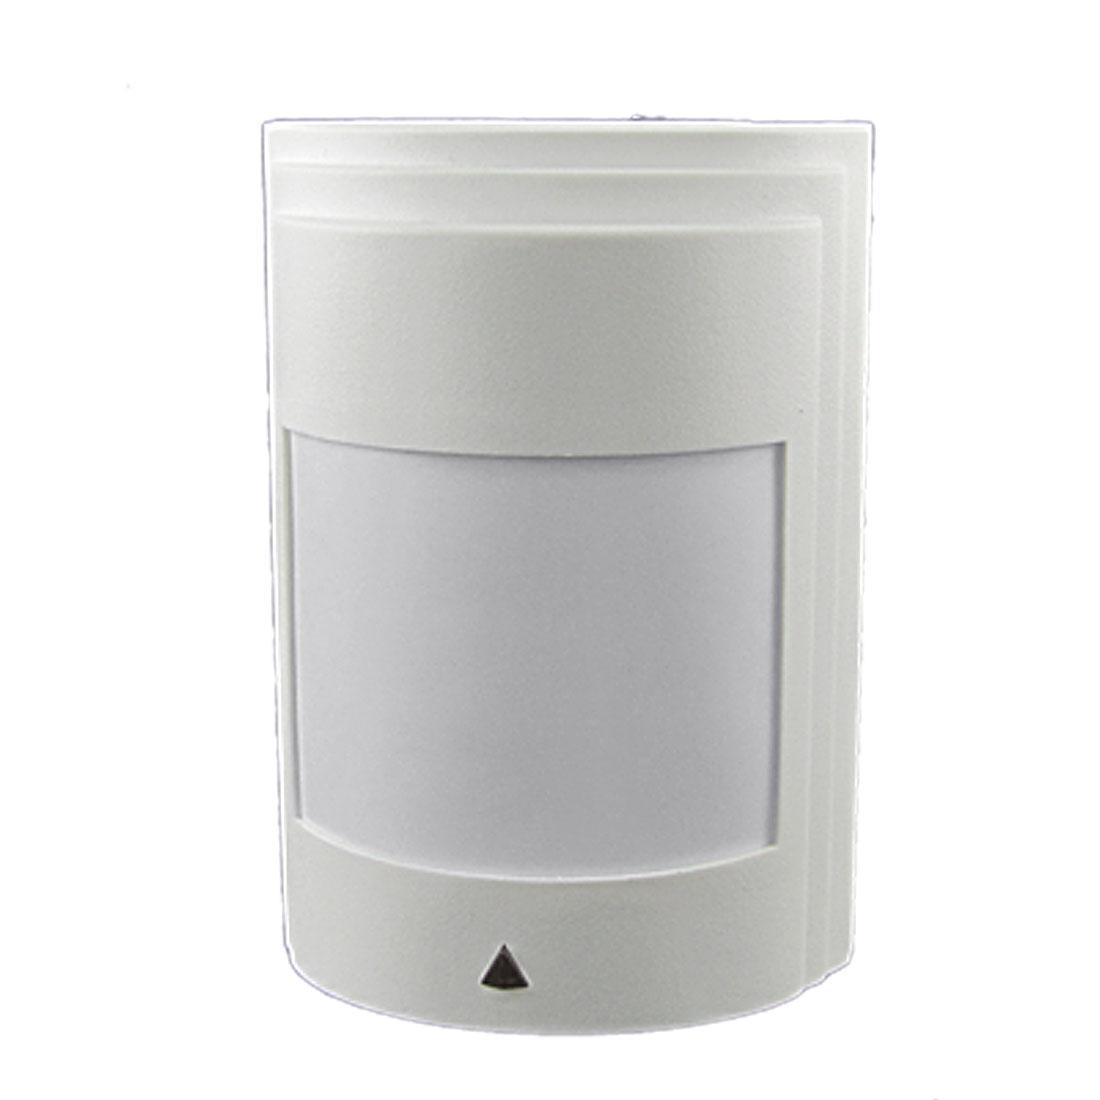 Home Security Wireless Infrared Motion Sensor Detector PIR Alarm 9-16V DC